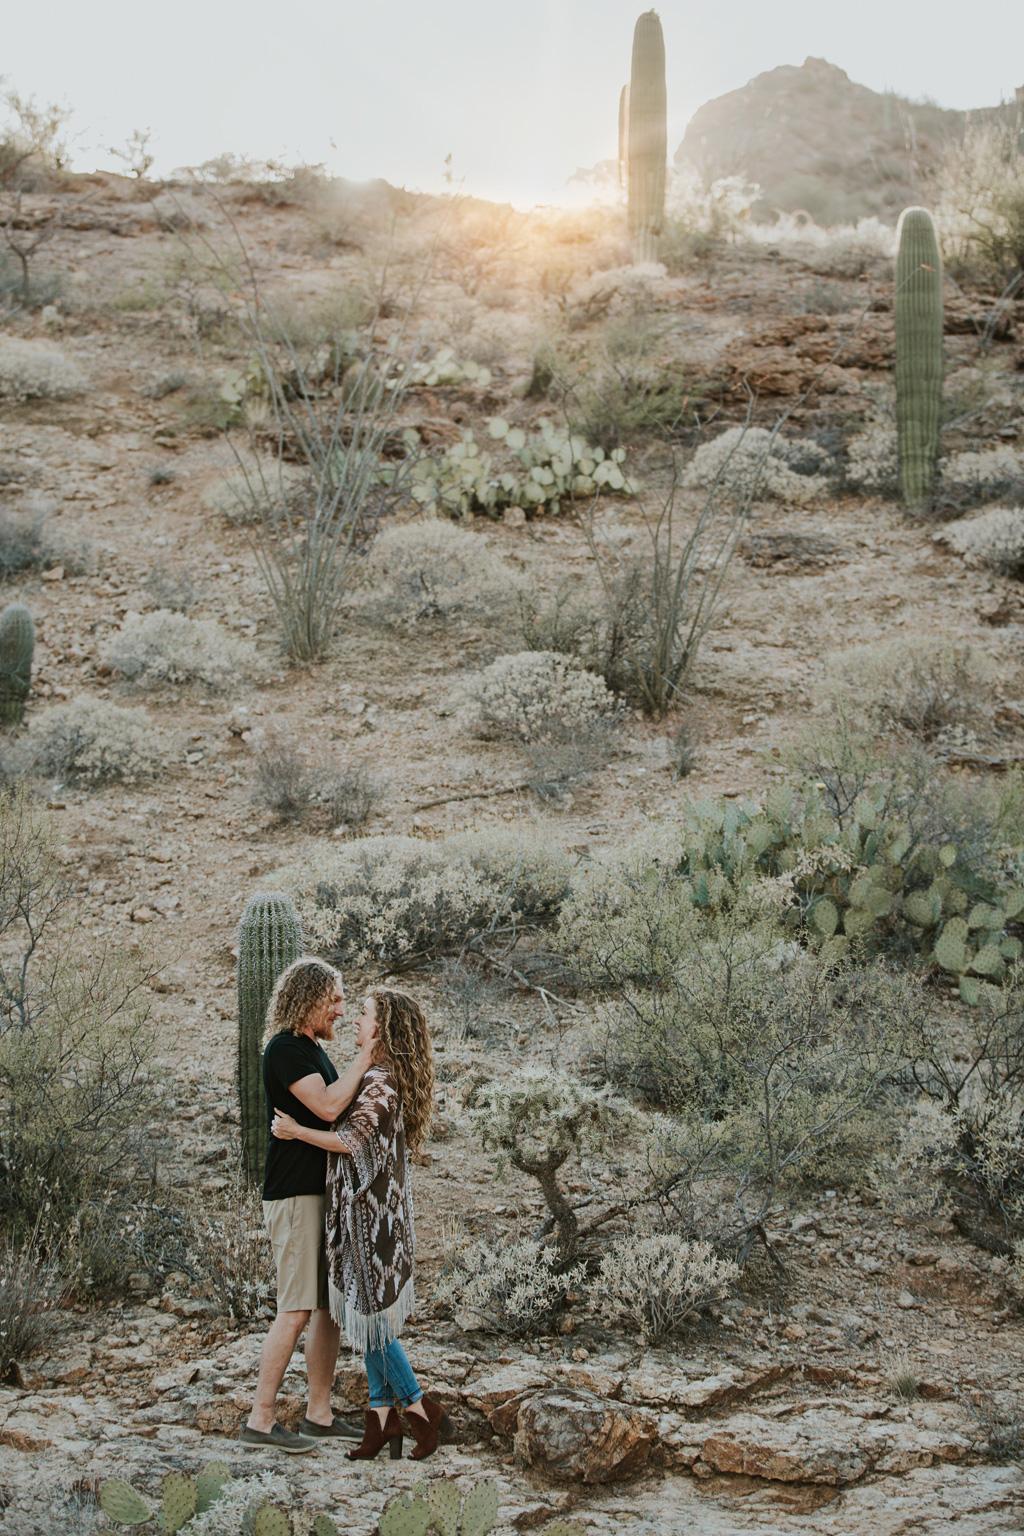 CindyGiovagnoli_Tucson_Arizona_engagement_lifestyle_portrait_Airstream_Excella_travel_trailer_camper_Saguaro_National_Park-020.jpg